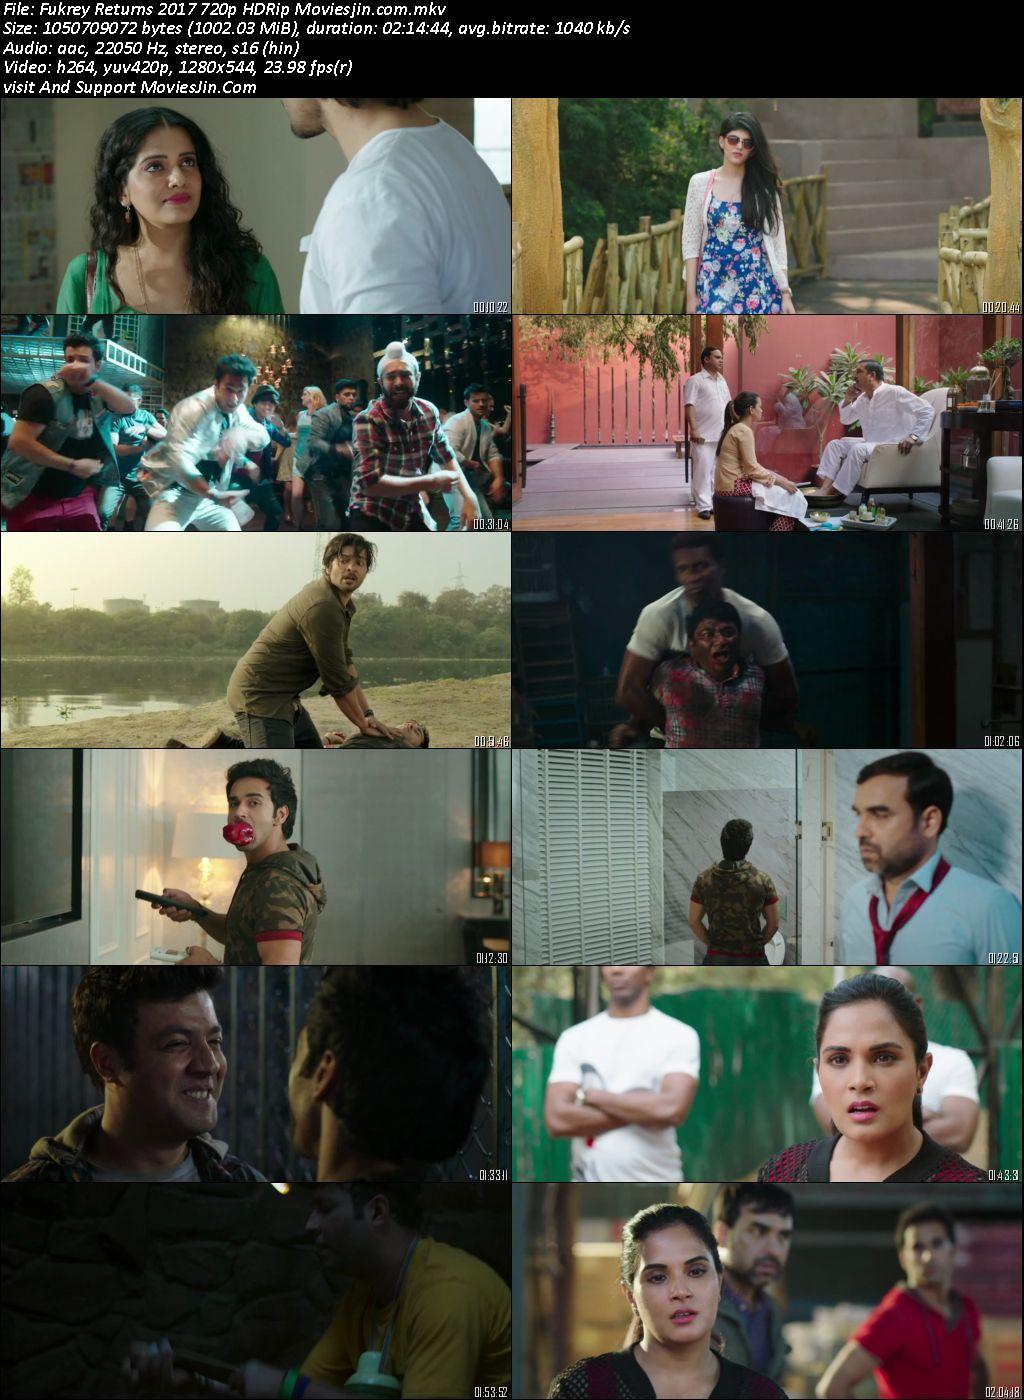 Fukrey Returns 2017 Download Full Movie Hindi 720p HD-Rip